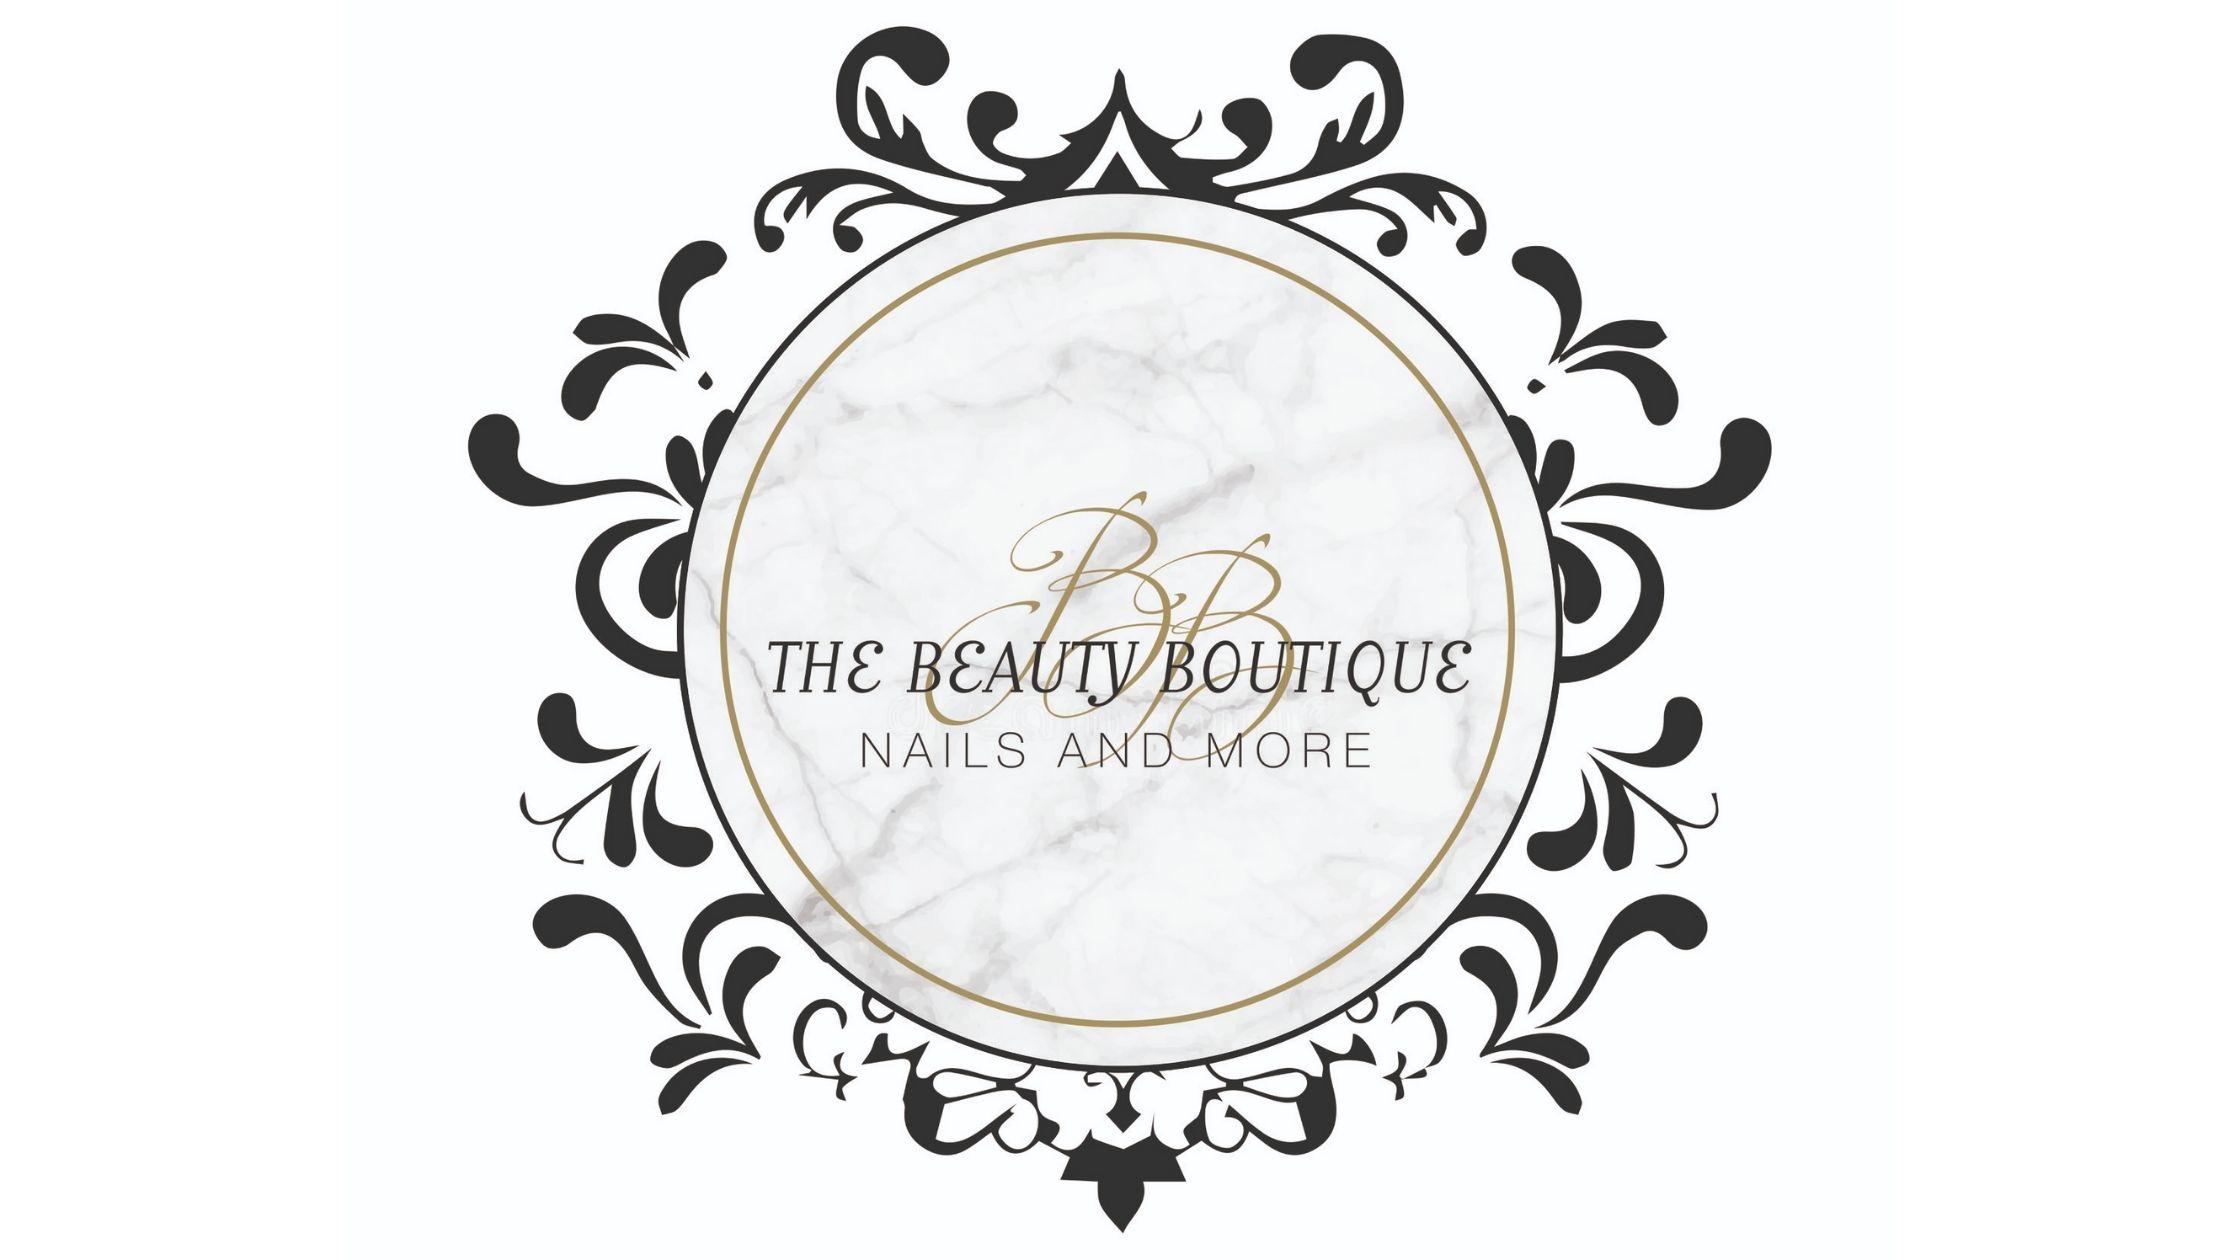 The Beauty Boutique